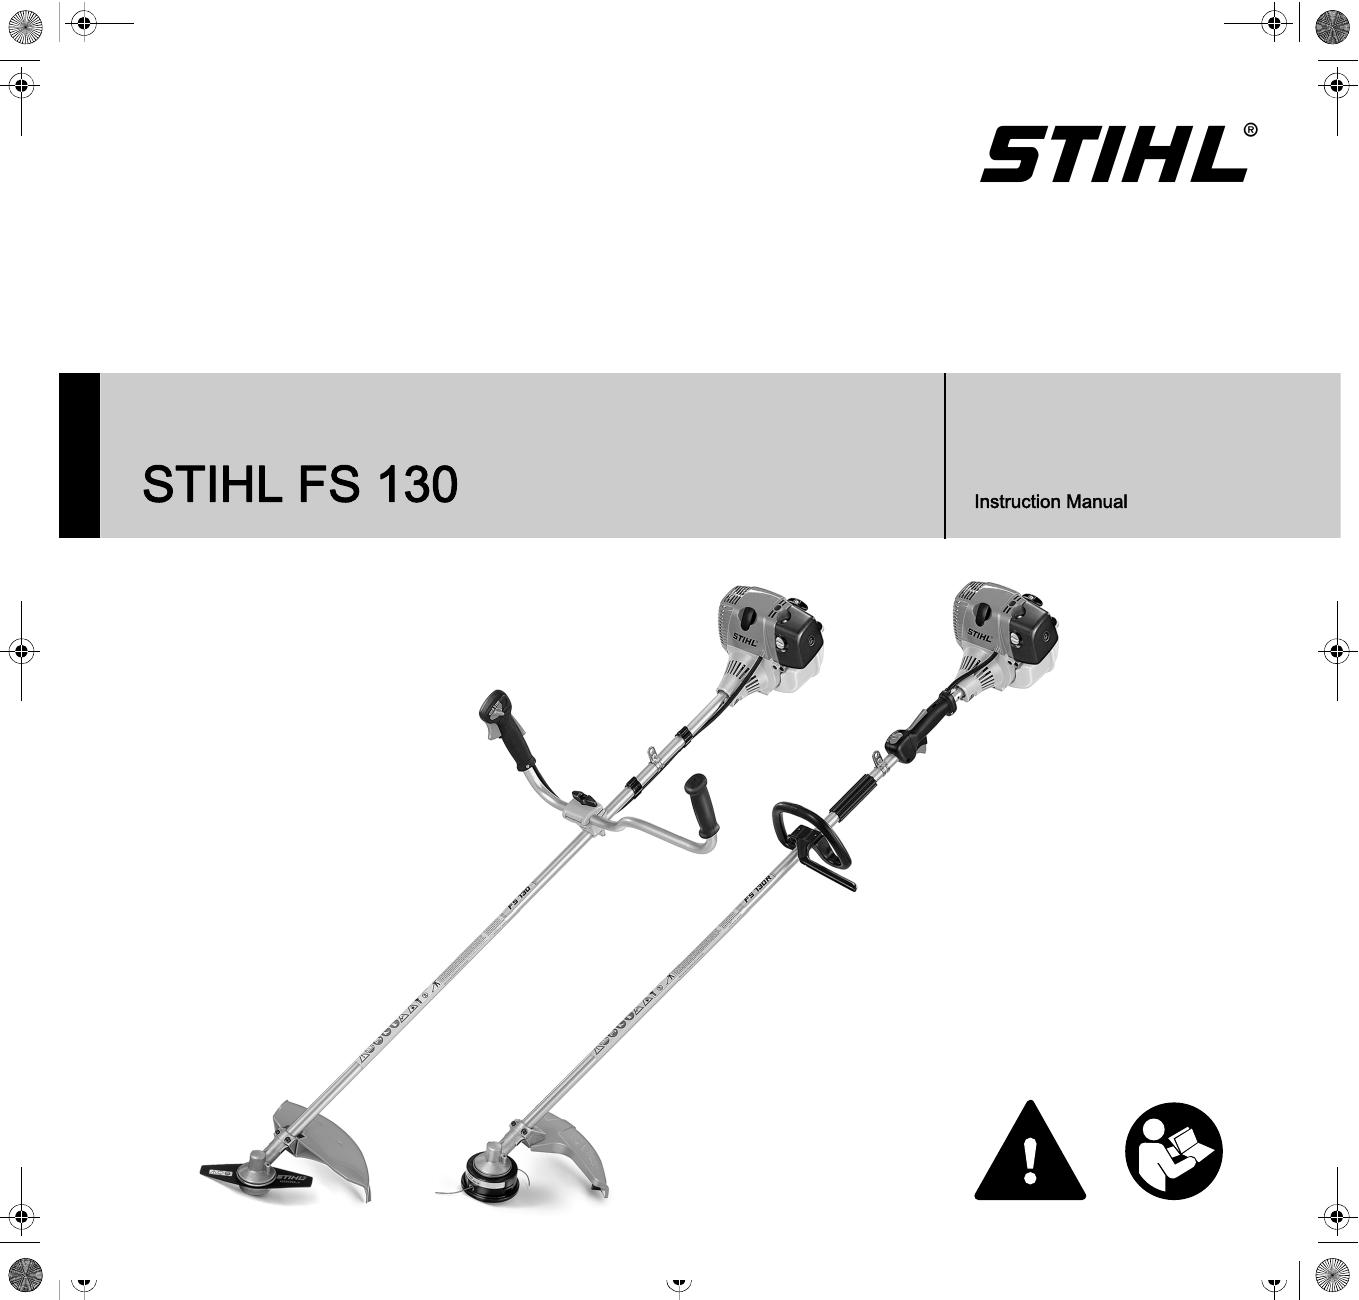 Genuine STIHL Trimmer HANDLEBAR HANDLE ONLY FS 130 131 110 111 90 91 89 200